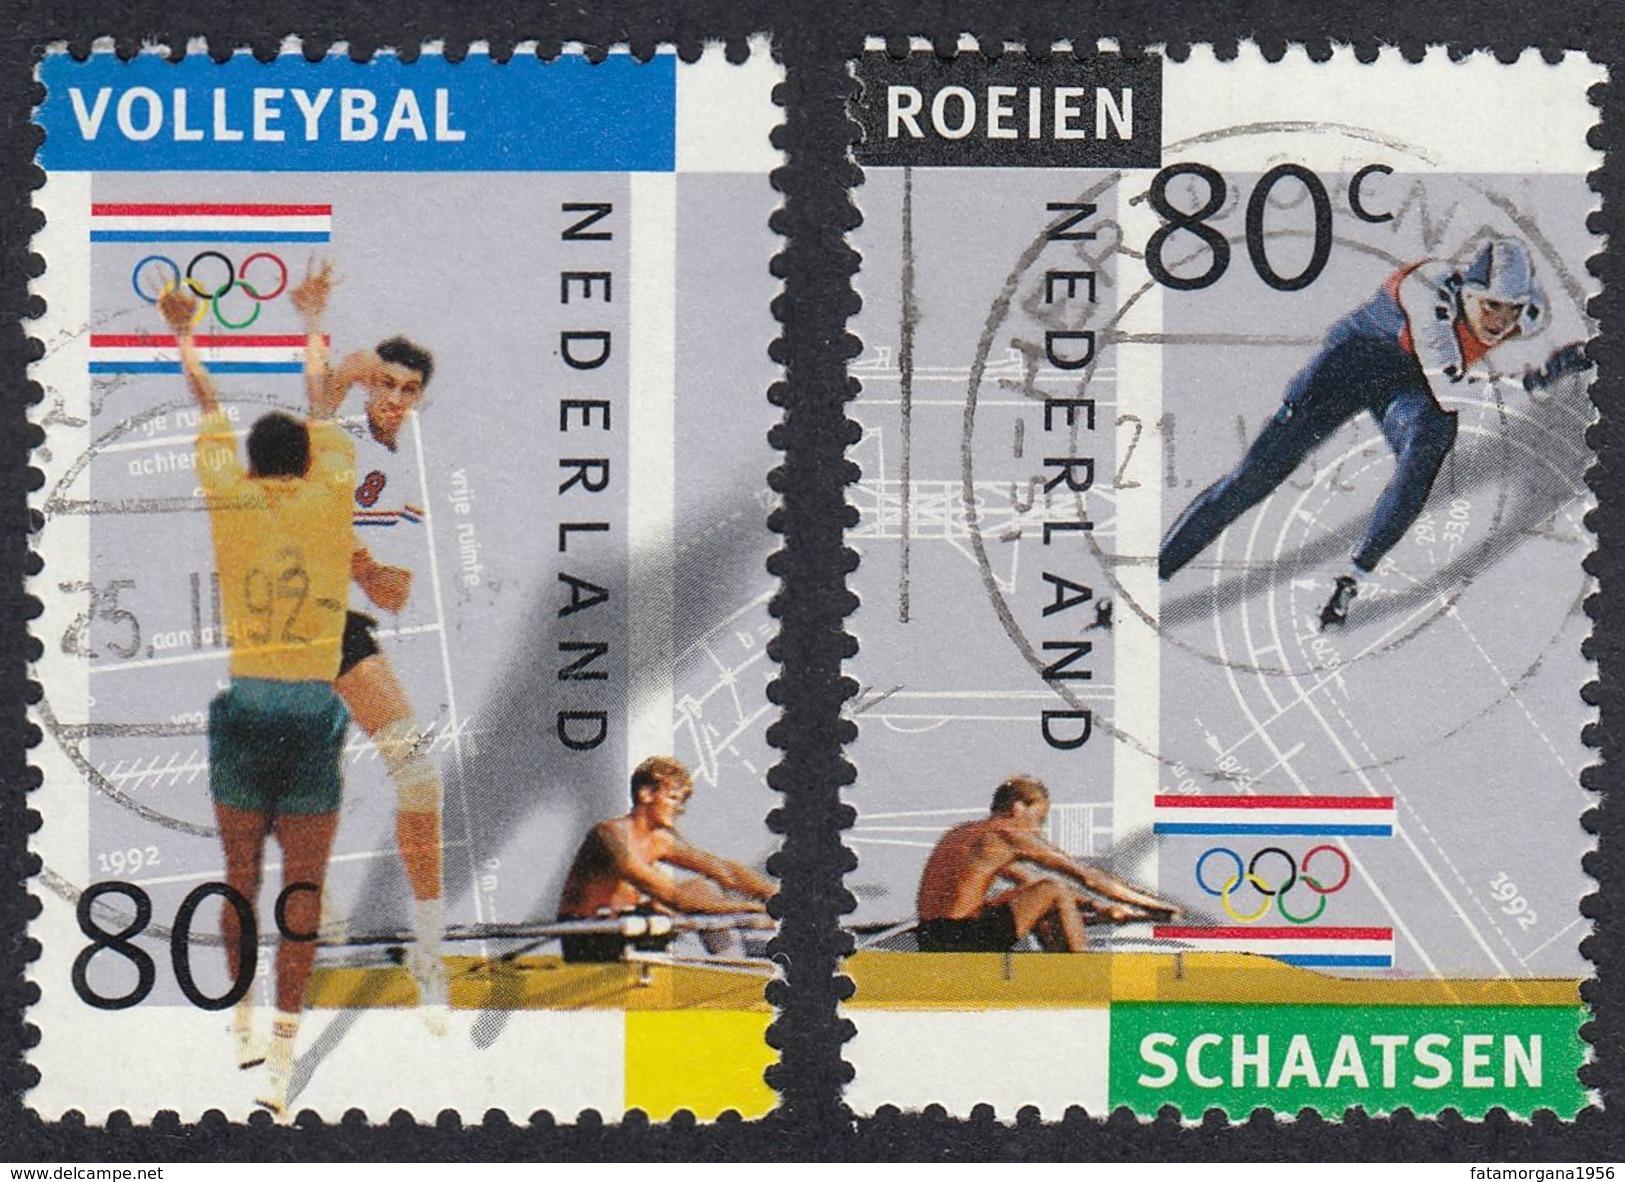 NEDERLAND - PAYS BAS -  OLANDA - 1992 - Lotto Due Valori Usati: Yvert 1393 E 1395, Usati. - Norwegen